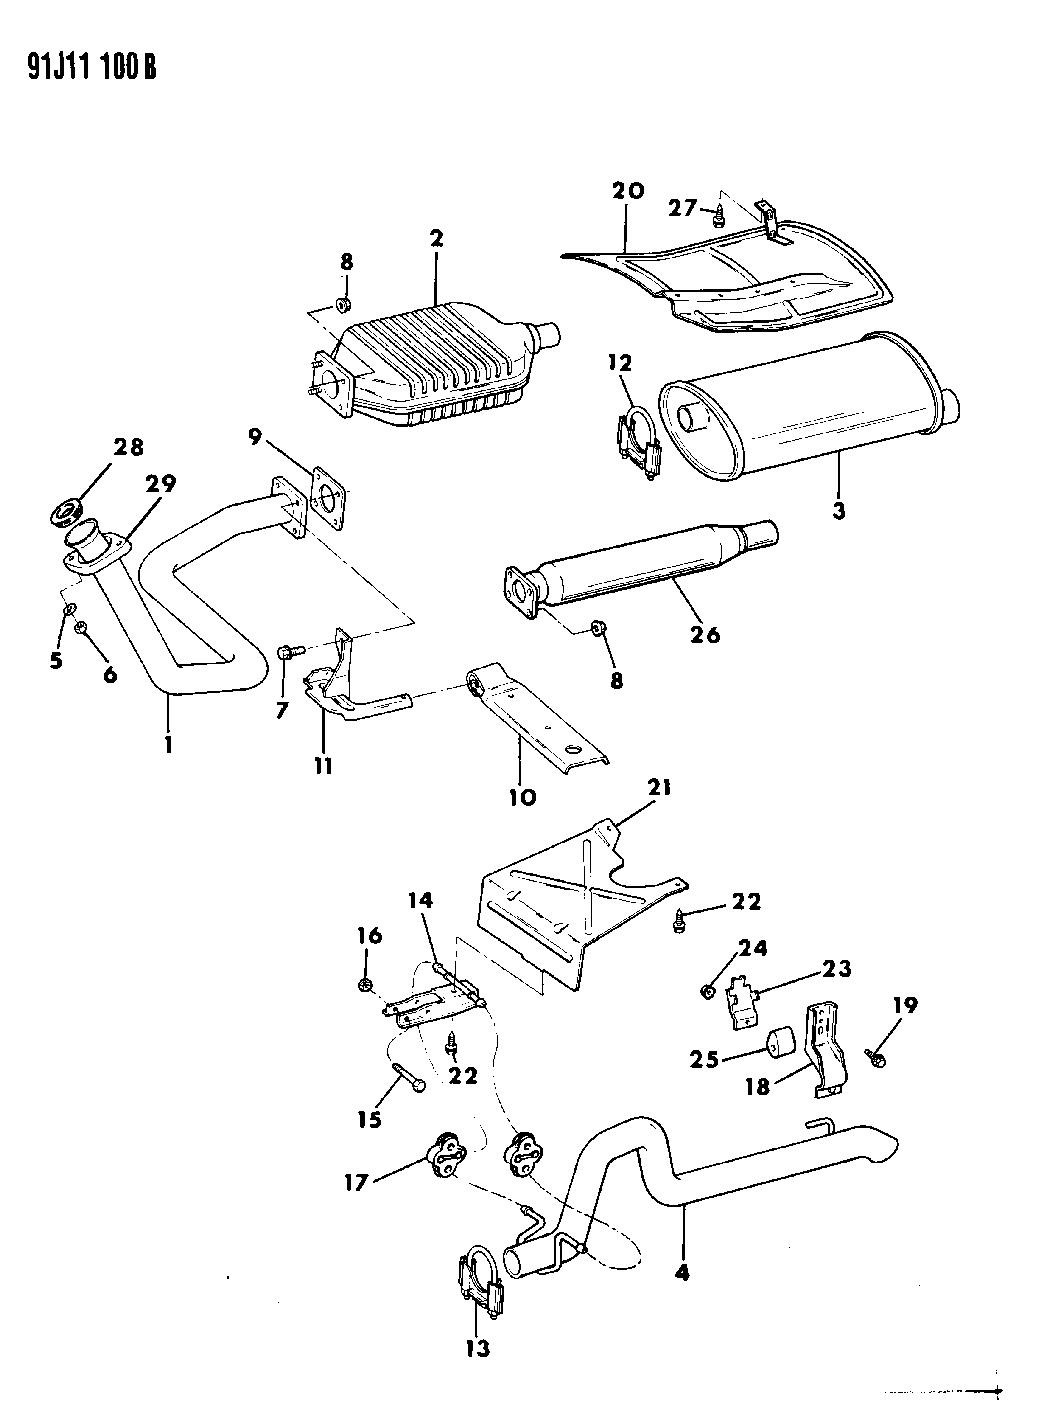 E0015773 Genuine Jeep Converter Catalytic 1991 Wrangler Engine Diagram Exhaust System